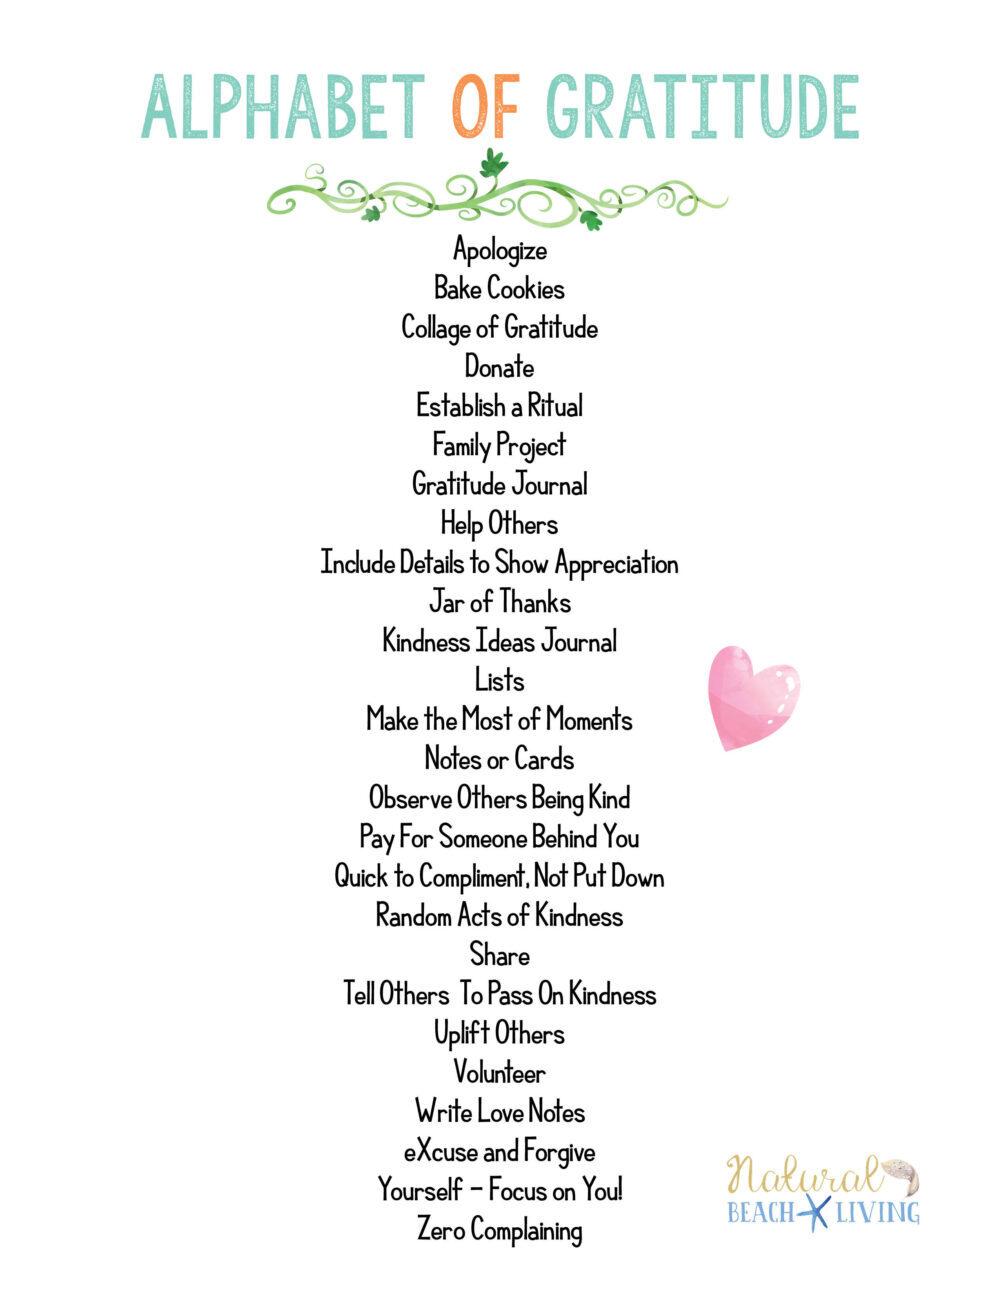 Alphabet Gratitude List To Help Practice Daily Gratitude Natural Beach Living